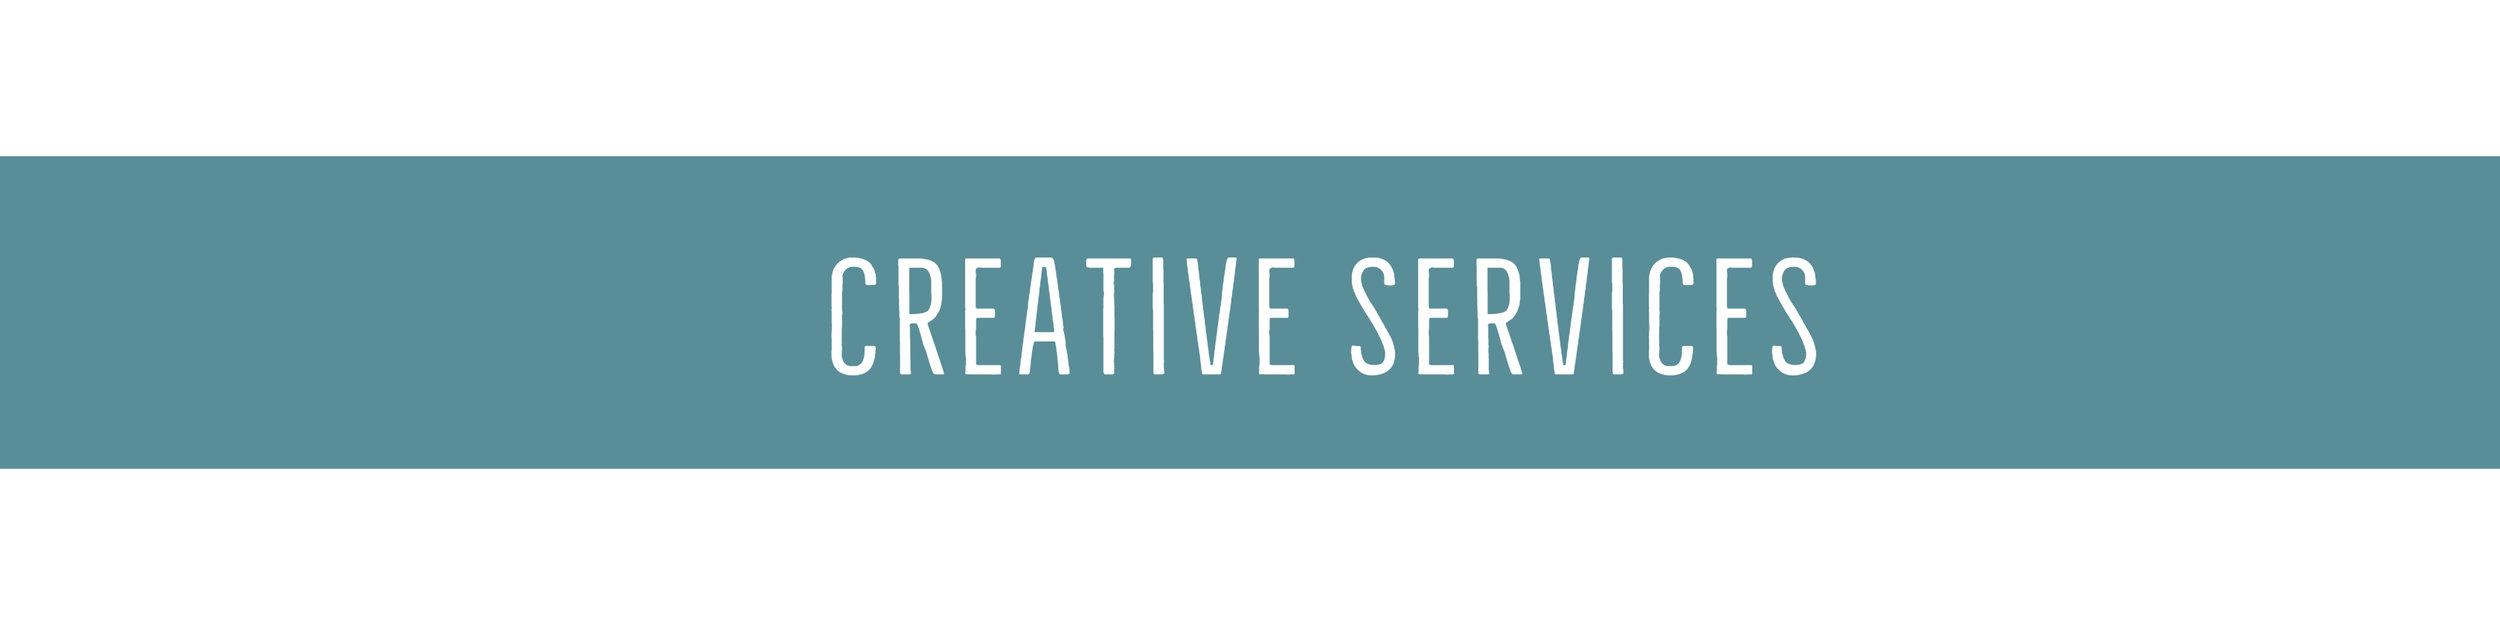 Creative Services.jpg